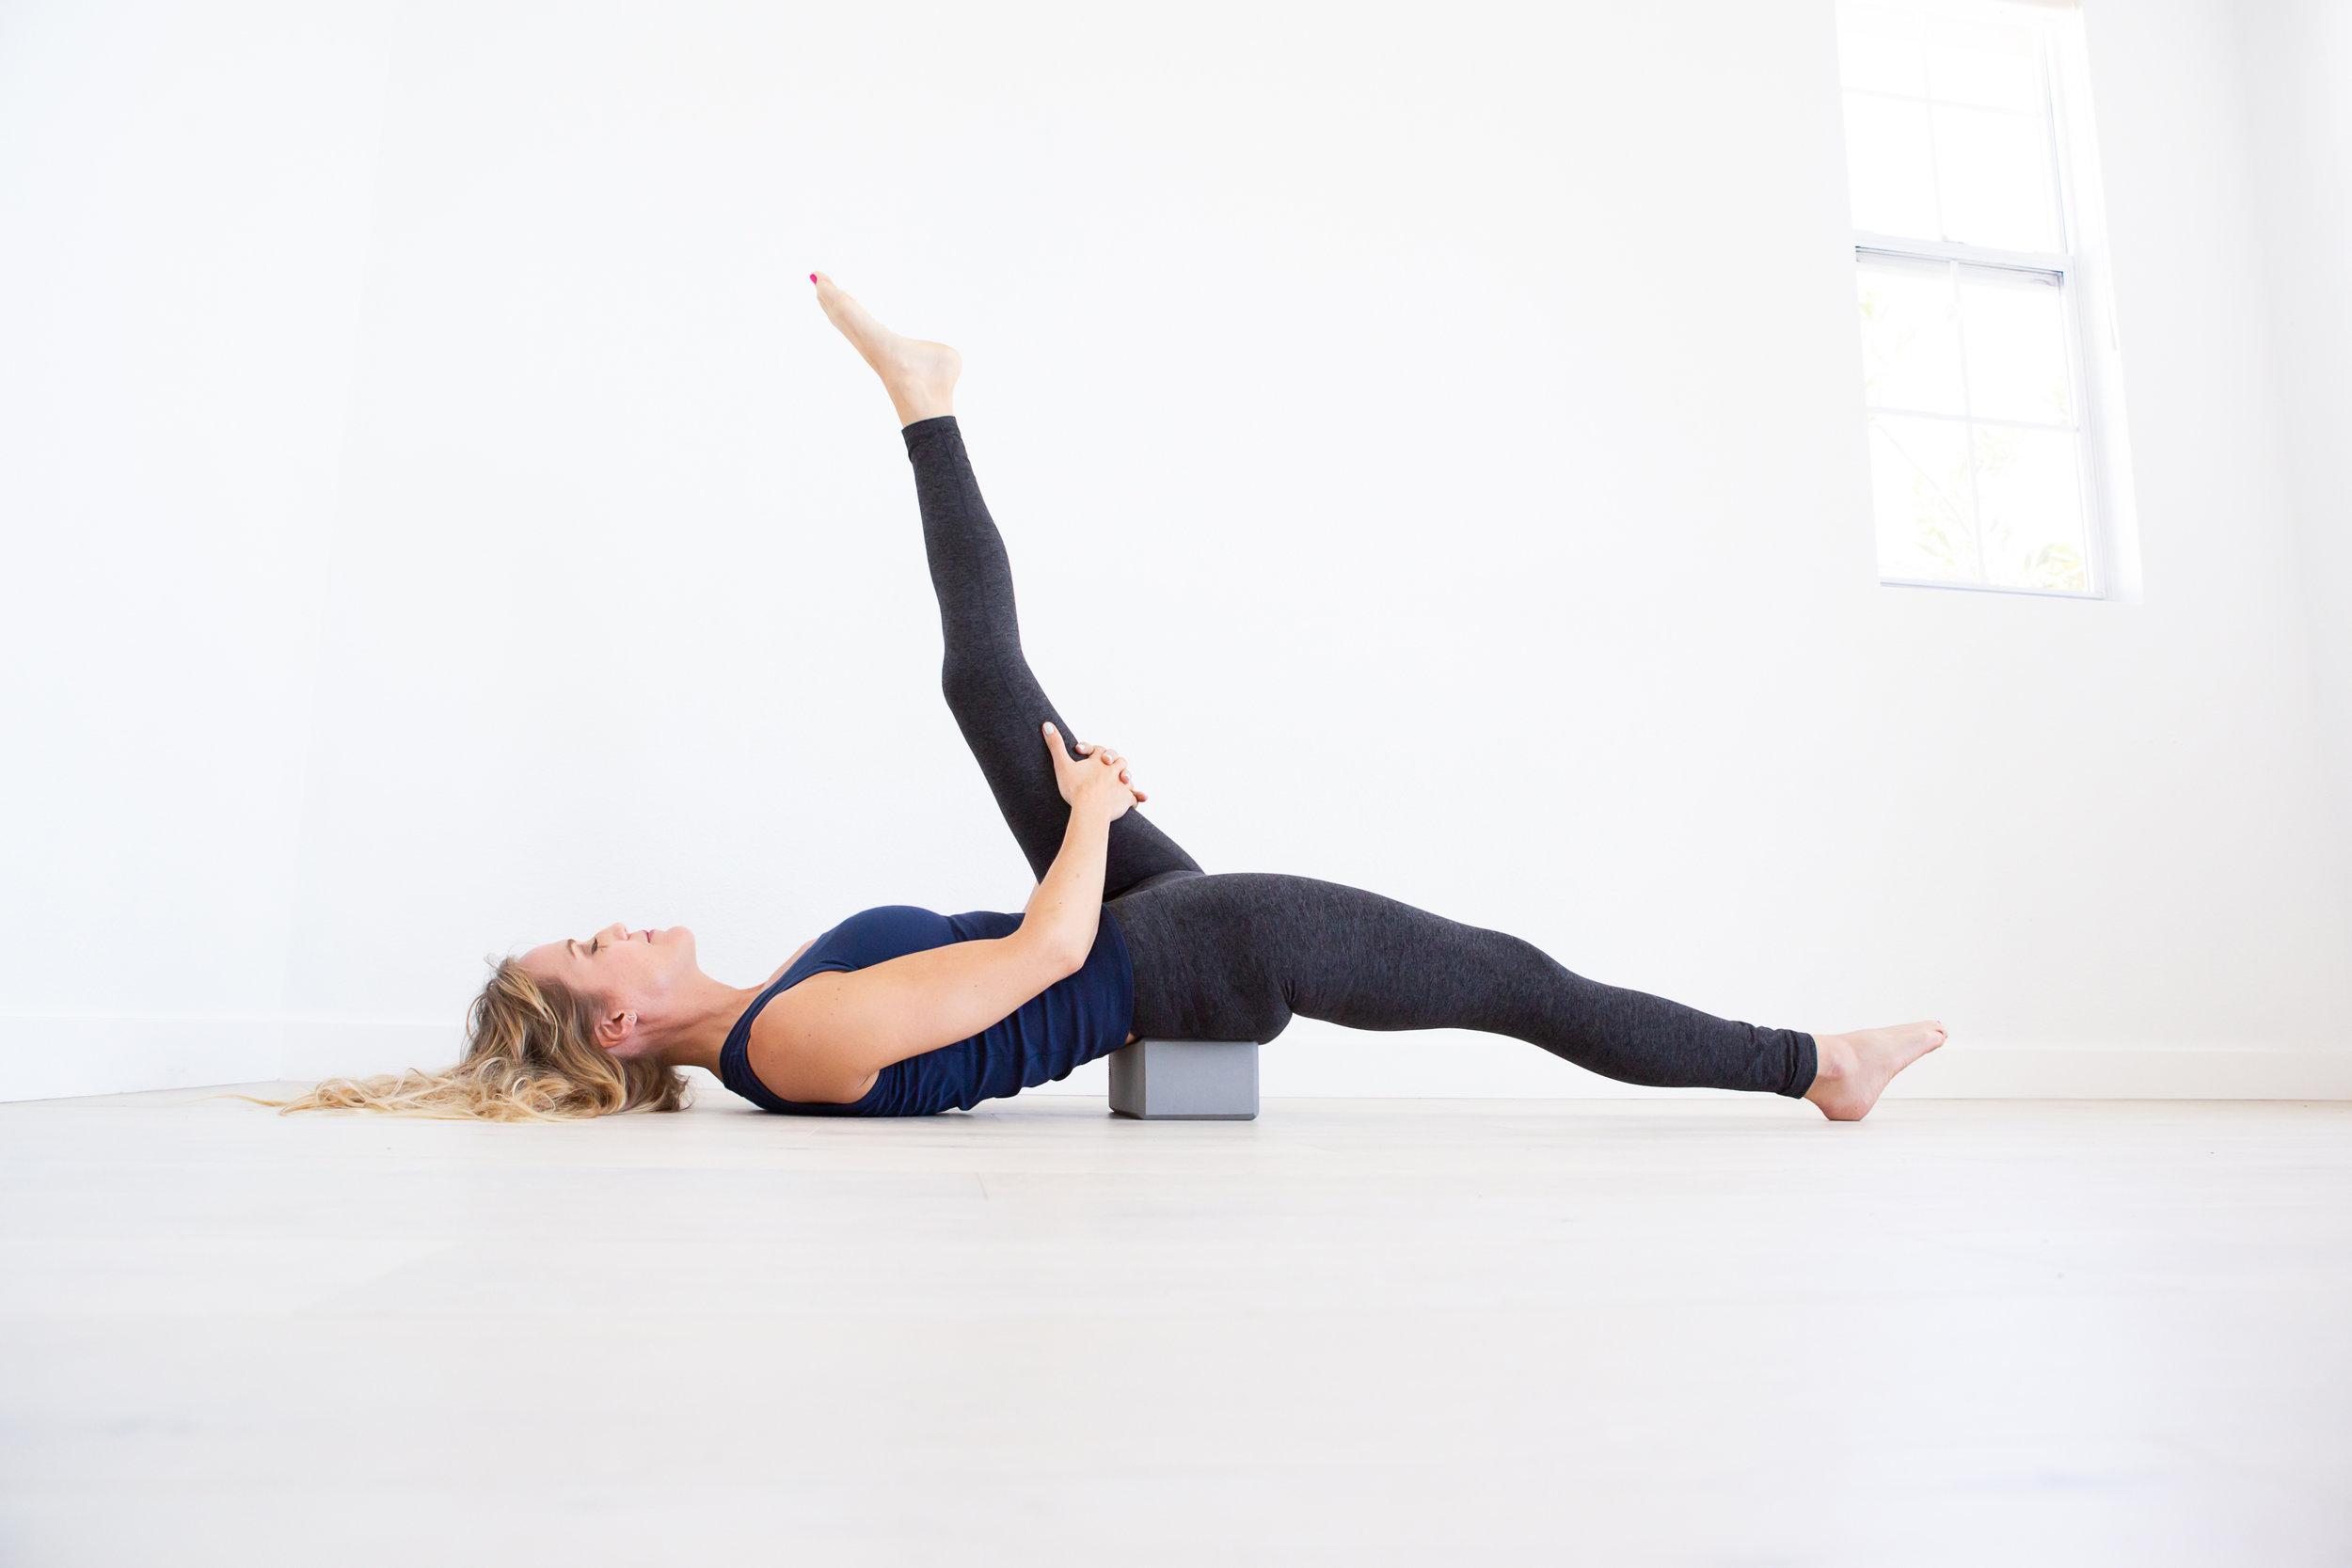 yoga teacher - Movement. Breathe. Restore.